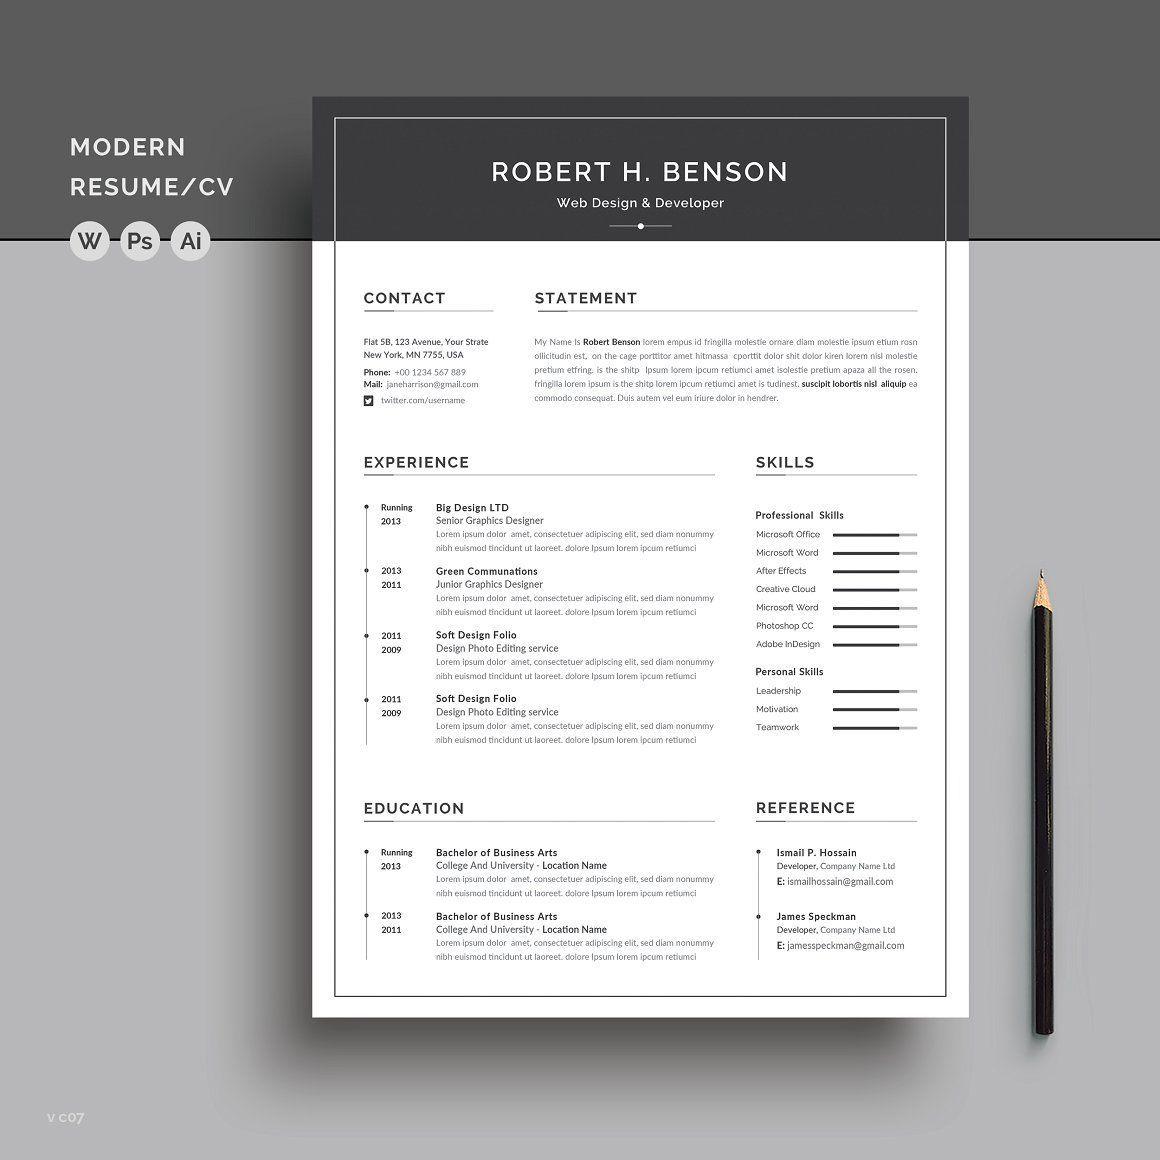 Word Resume/CV in 2020 Resume cv, Resume words, Cover